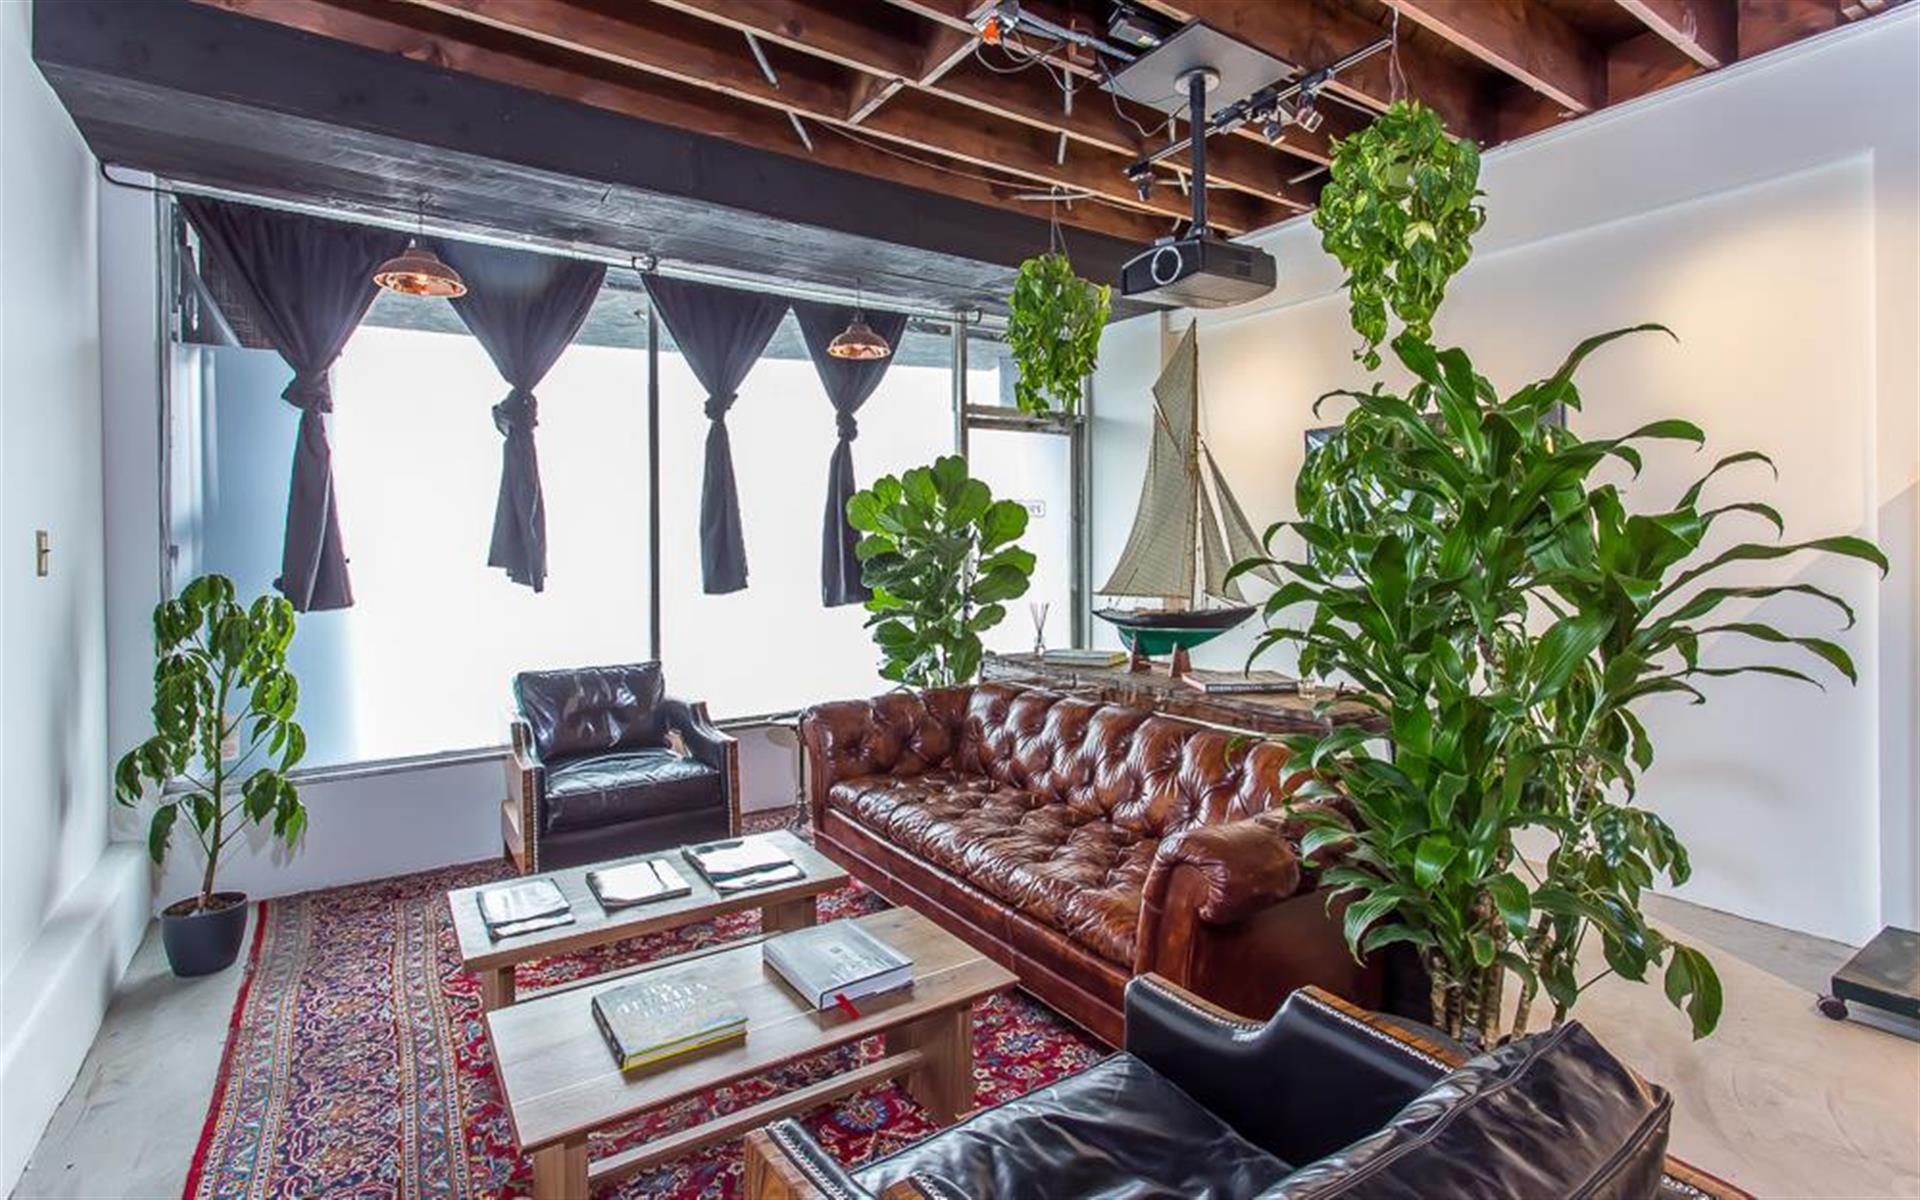 TheWorkBar.LA - Hot Desks, Flexible Work Stations